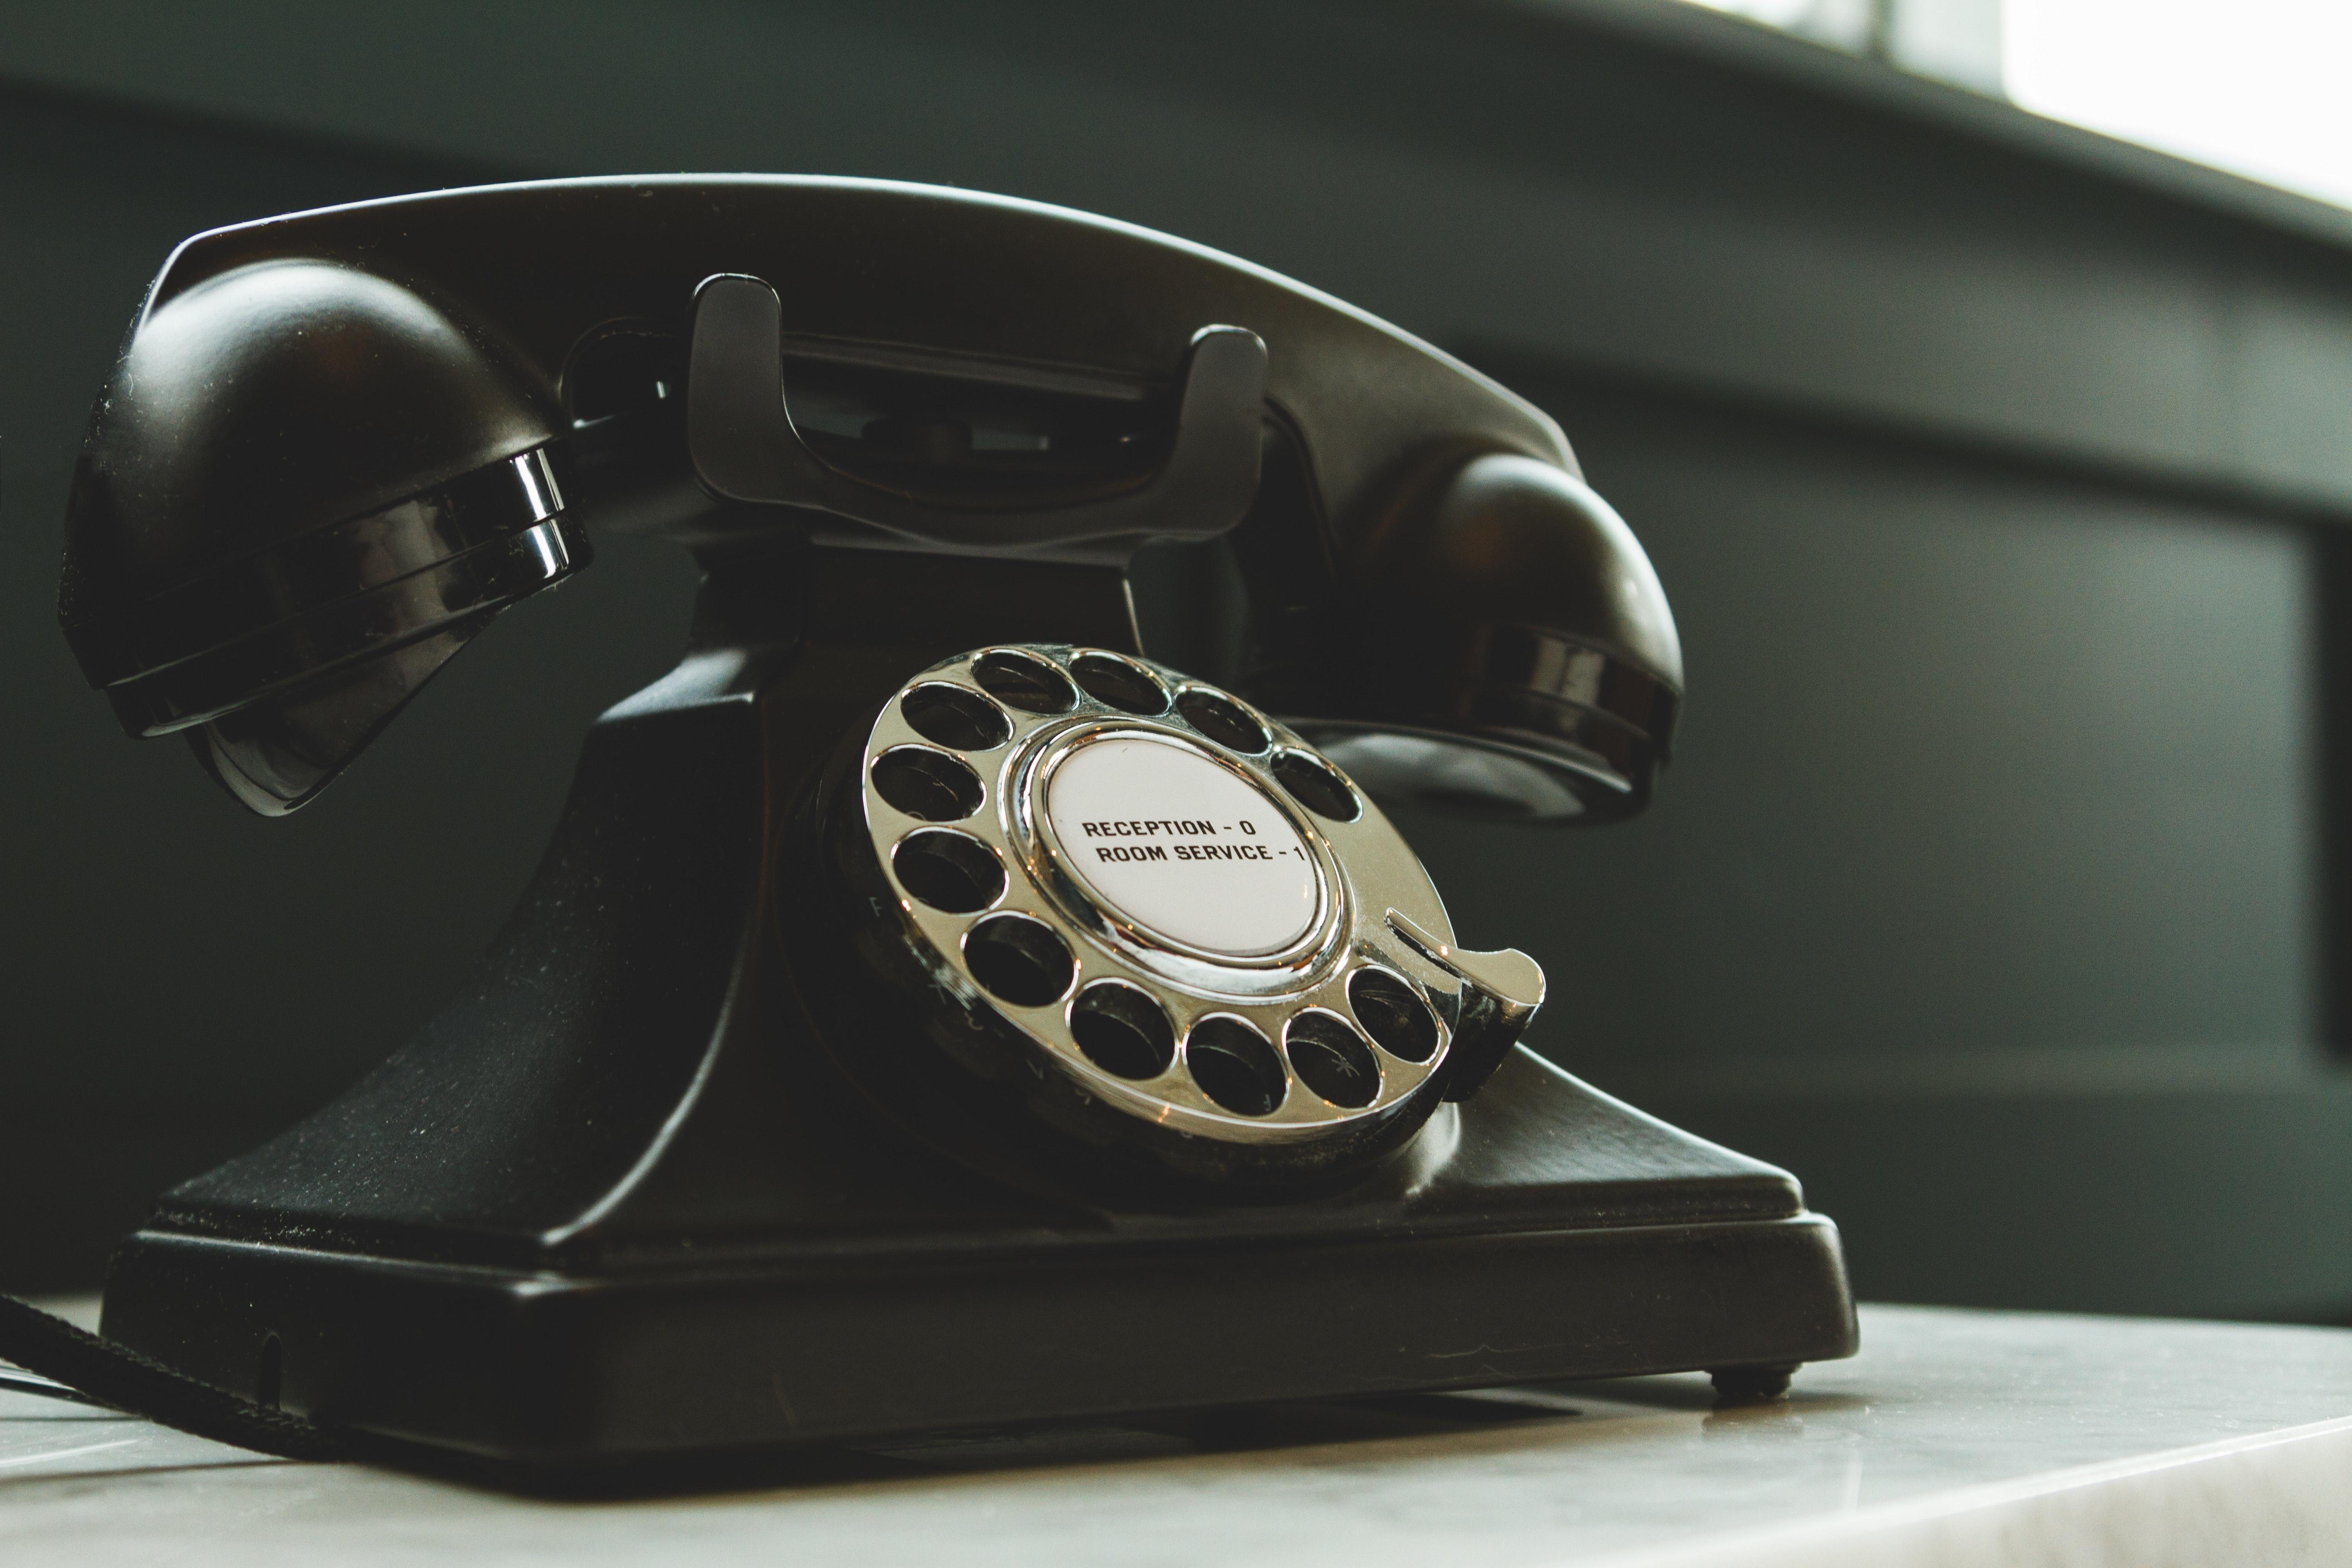 A black classic turn dial telephone